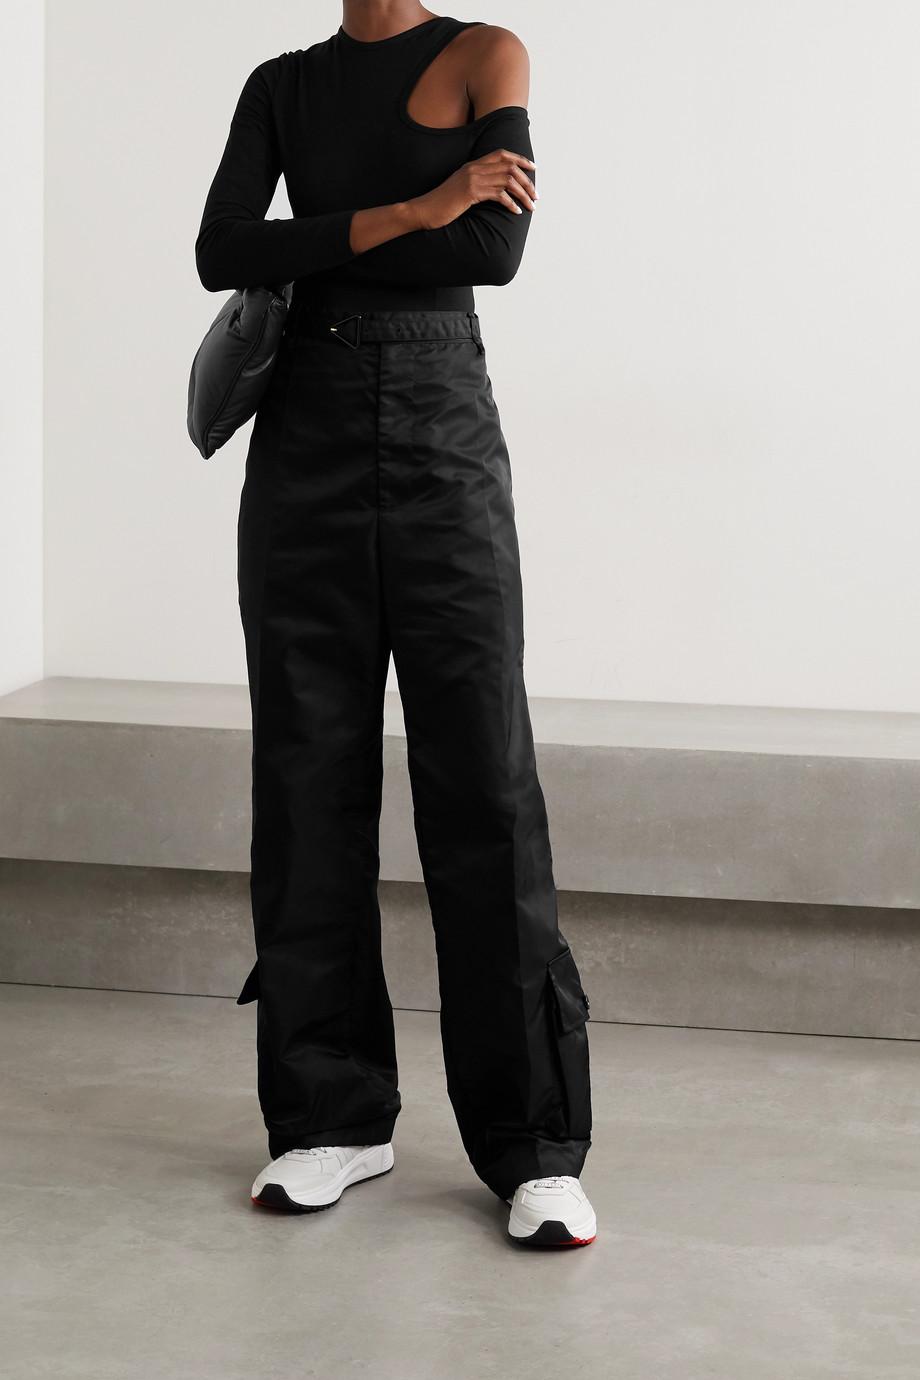 Ninety Percent 【NET SUSTAIN】挖剪弹力天丝平纹布连体紧身衣